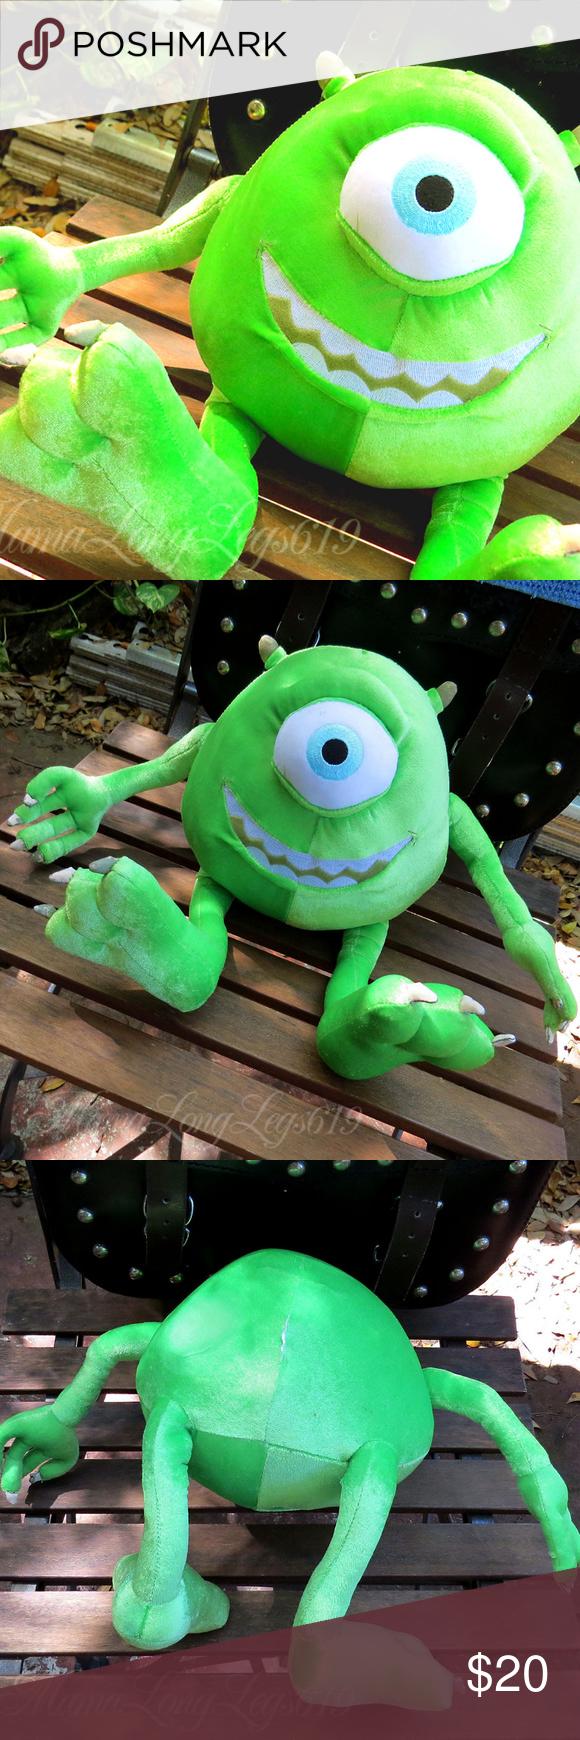 Disney Pixar Monsters Inc Mike Wazowski Plush Doll